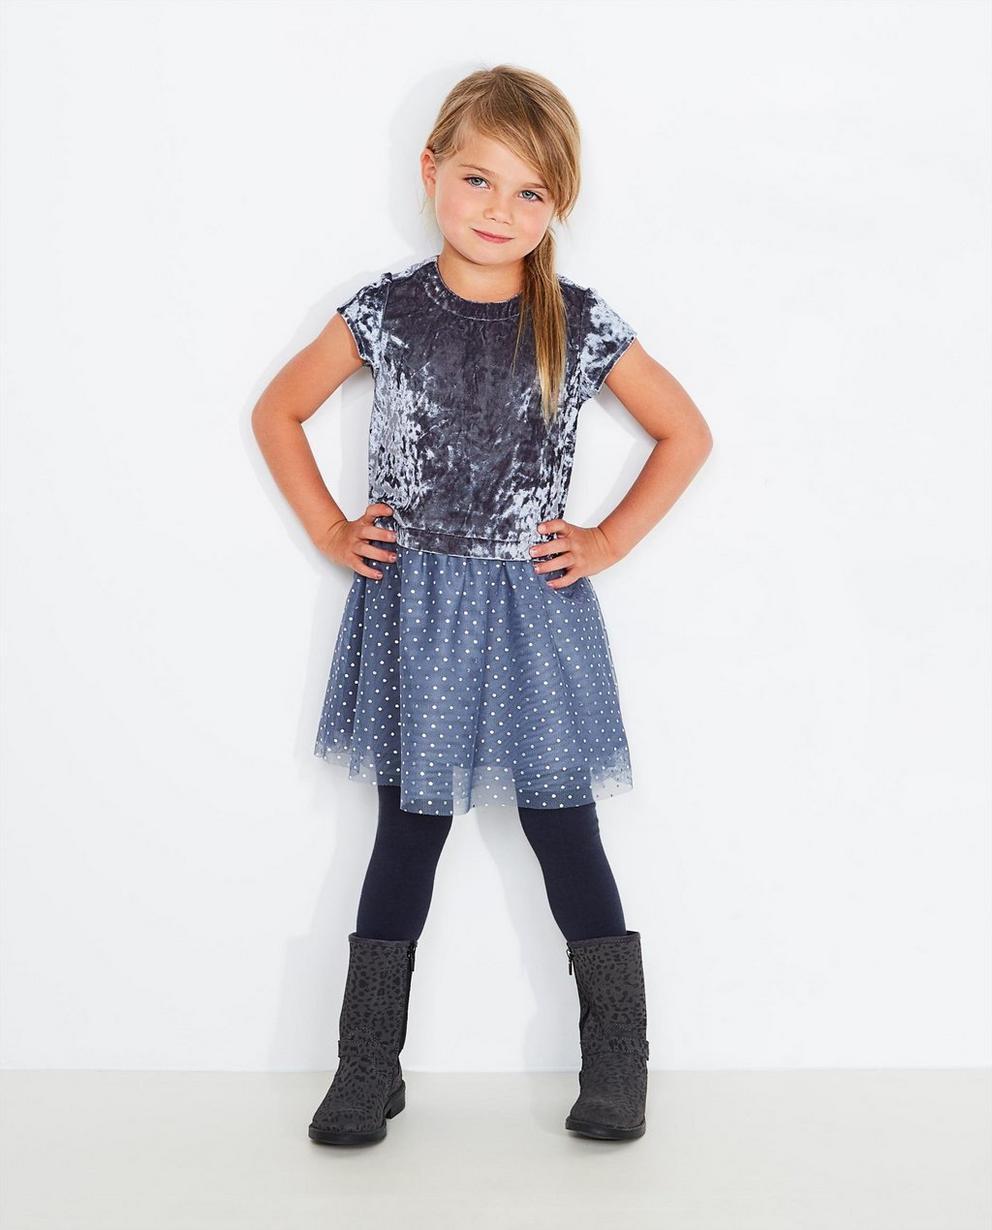 Blaugraues Samtkleid - Prinsessia - Prinsessia